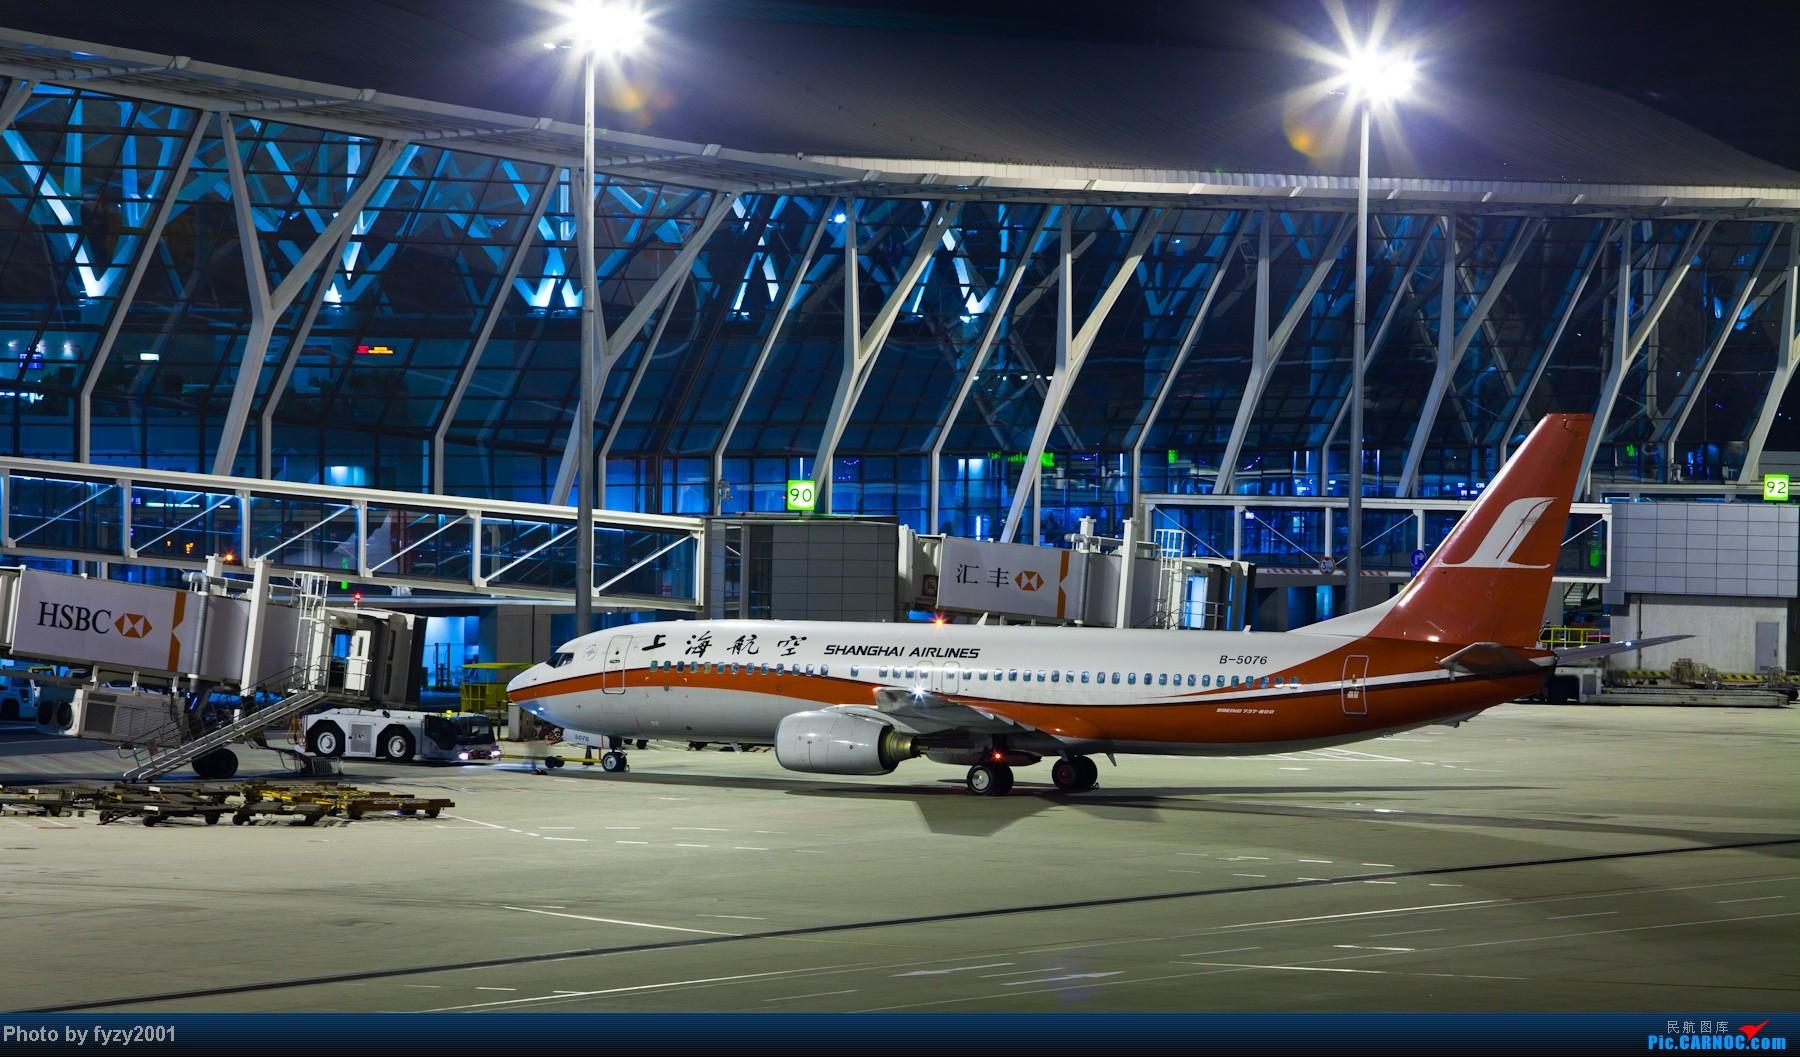 Re:[原创][无锡西站]长假PVG蹲守~~~~只发大图,多图杀猫~~~~ BOEING 737-800 B-5076 中国上海浦东机场